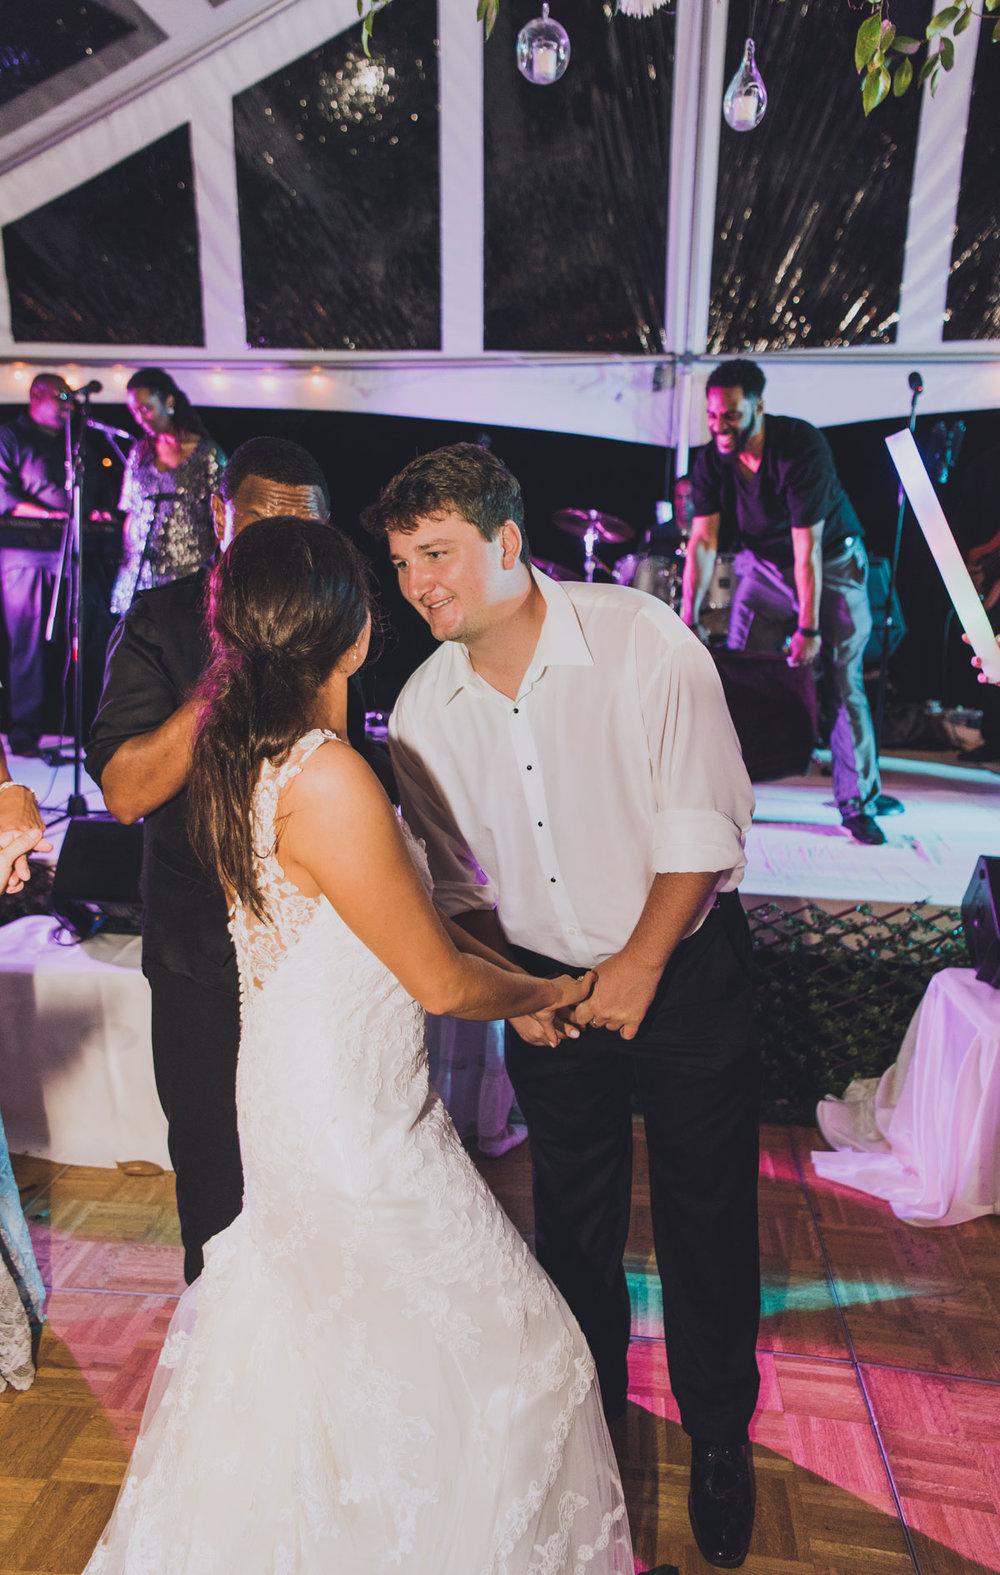 Dance Floor and Staging Rentals for Weddings